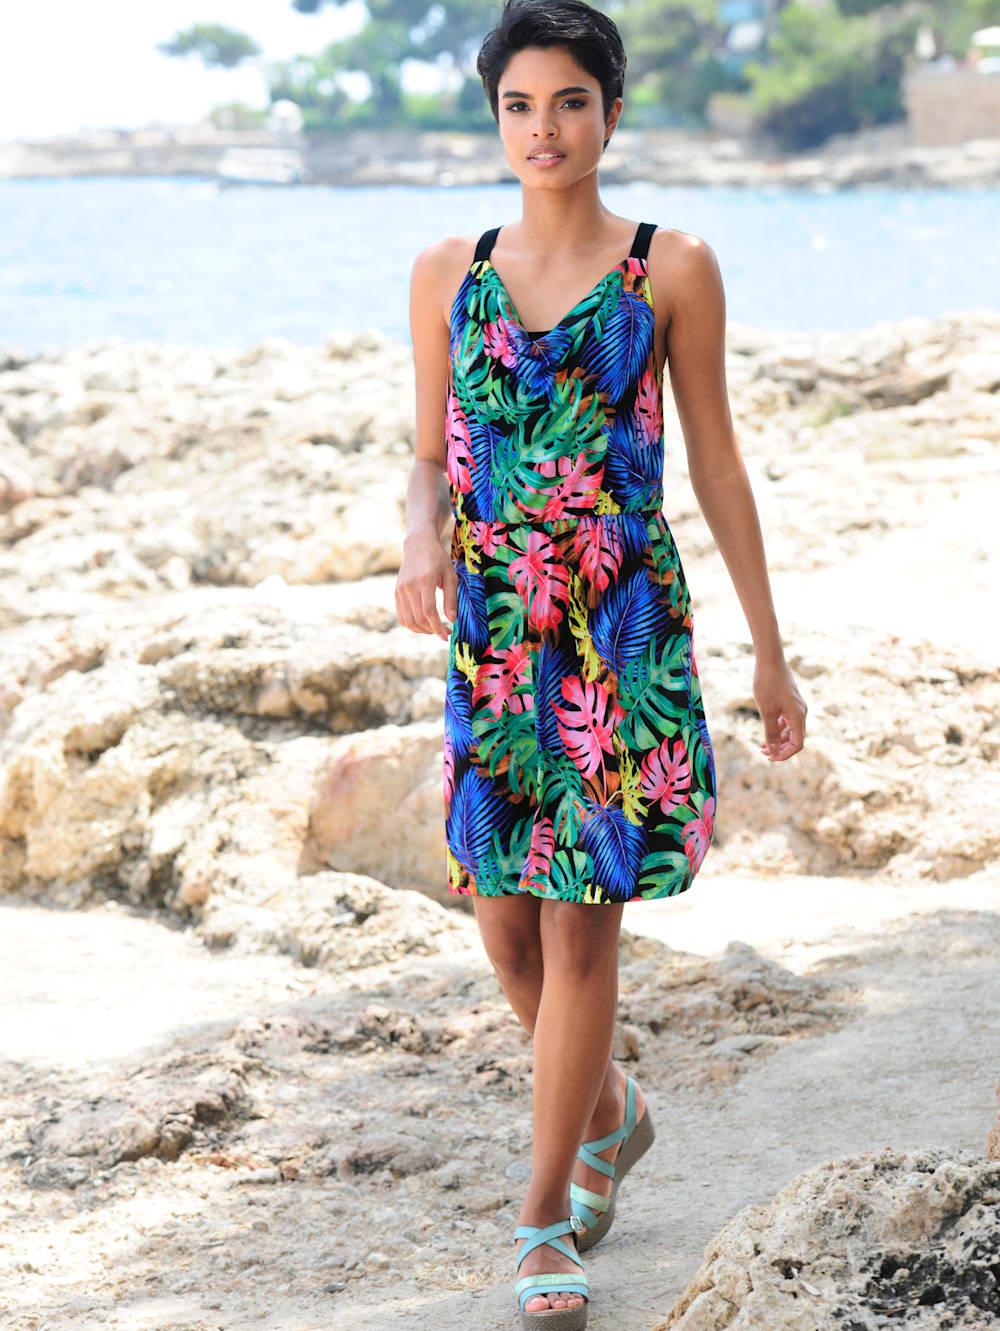 alba moda strandkleid mit wasserfallausschnitt | alba moda